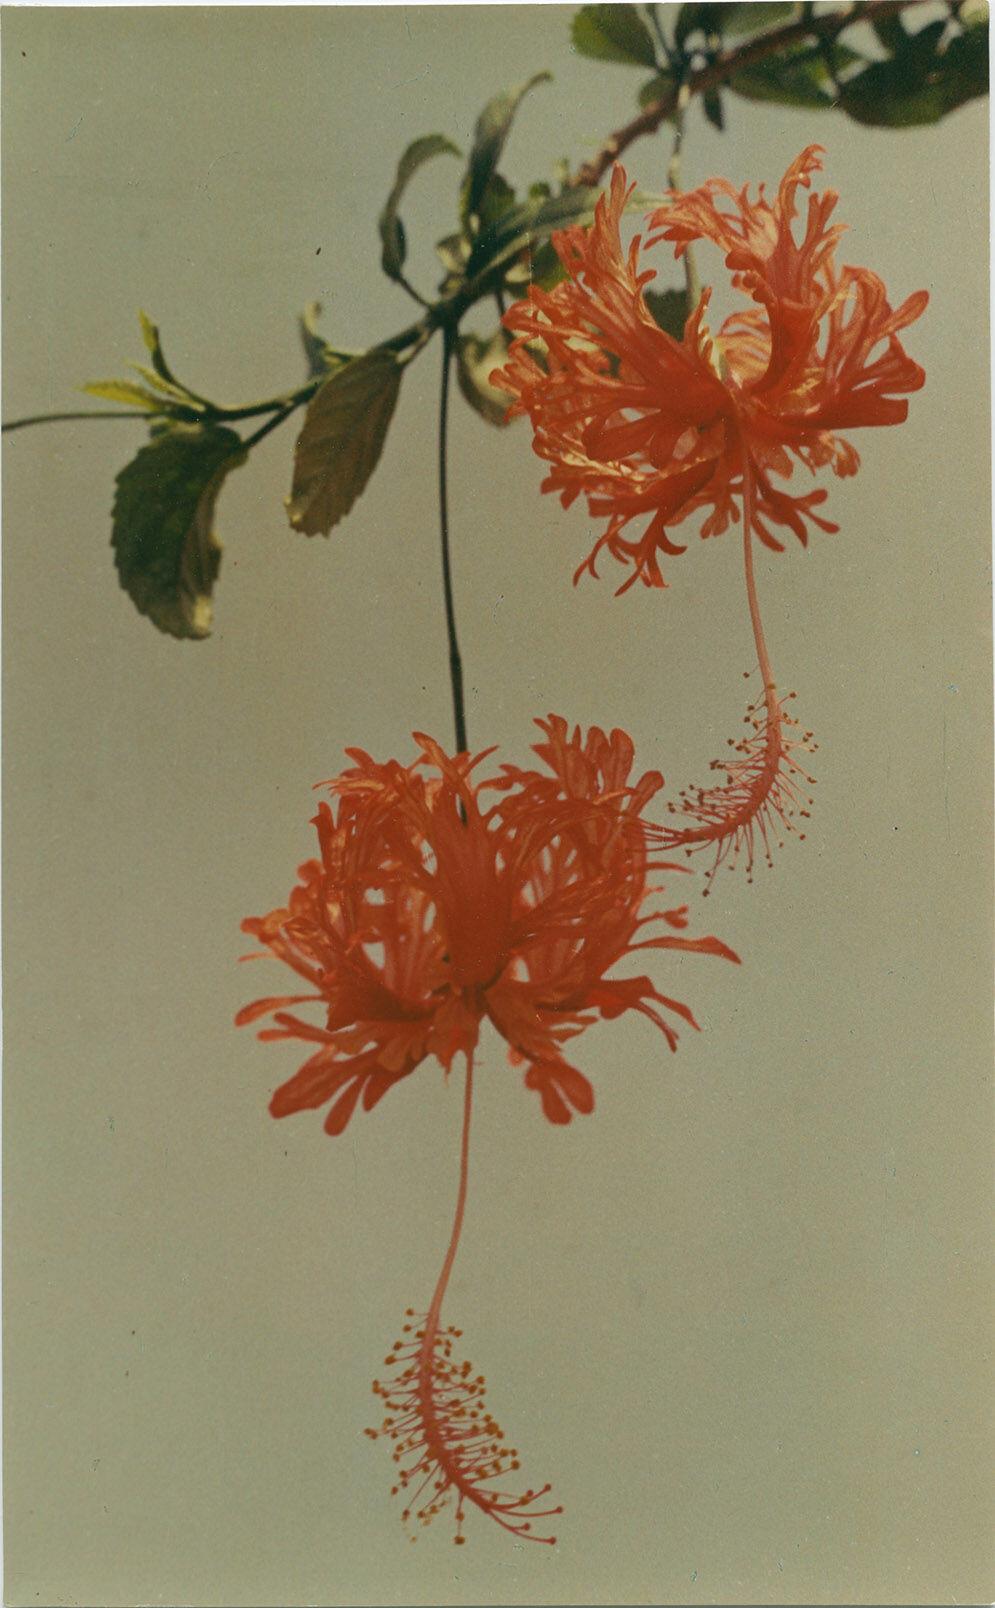 Yinxian Wu, Chinese Hibiscus 010, 1977. Courtesy of Lévy Gorvy.